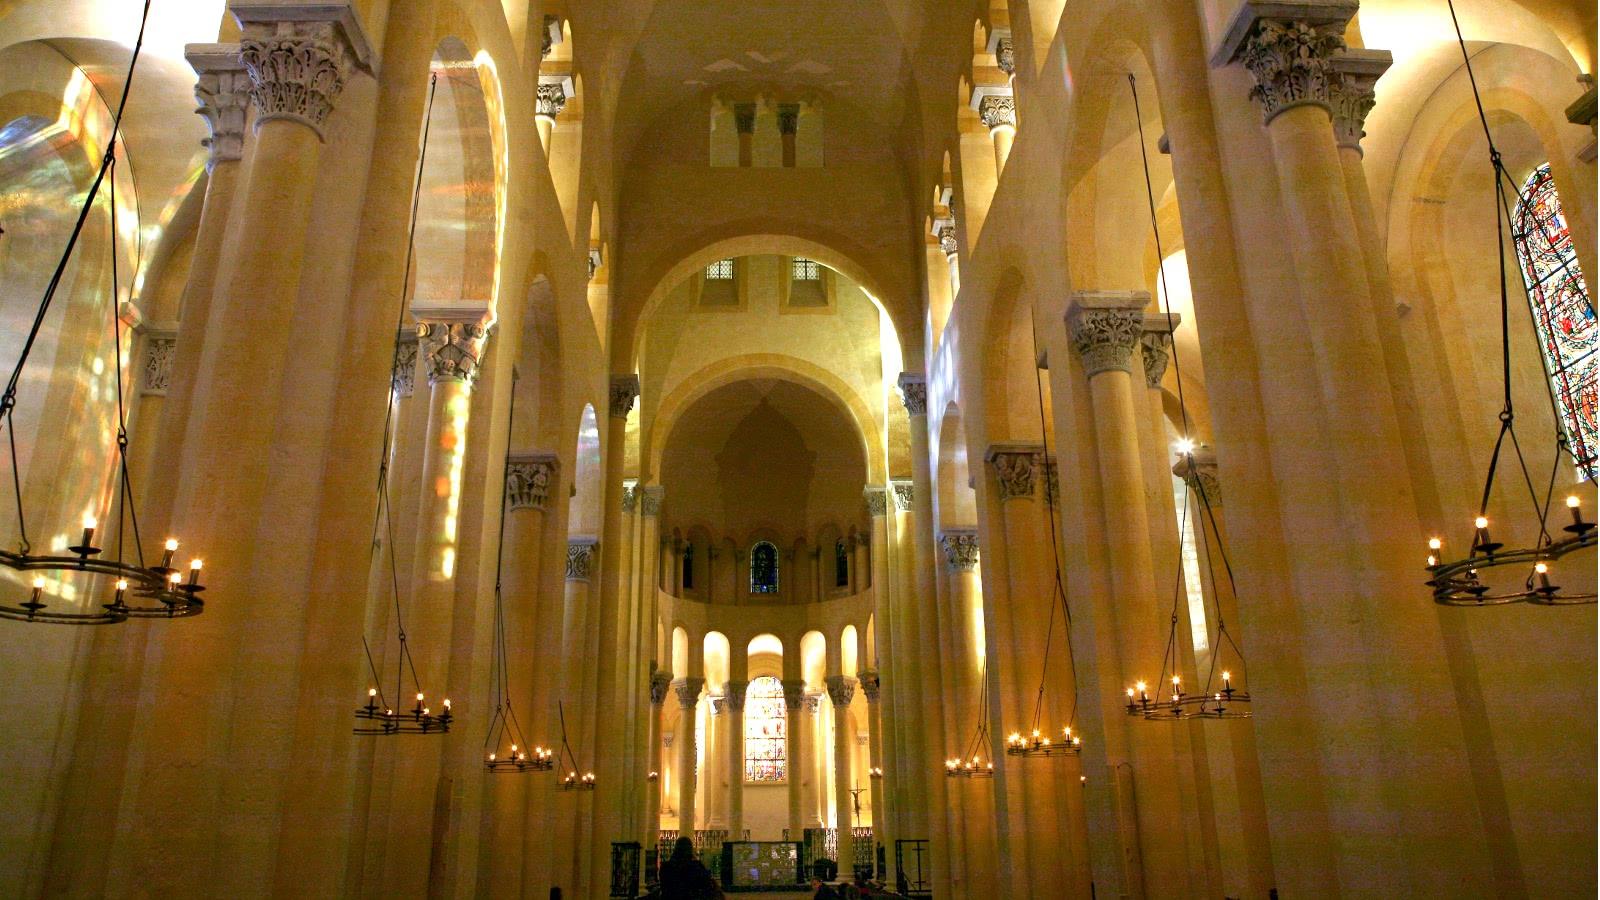 Nef Basilique Notre Dame du Port